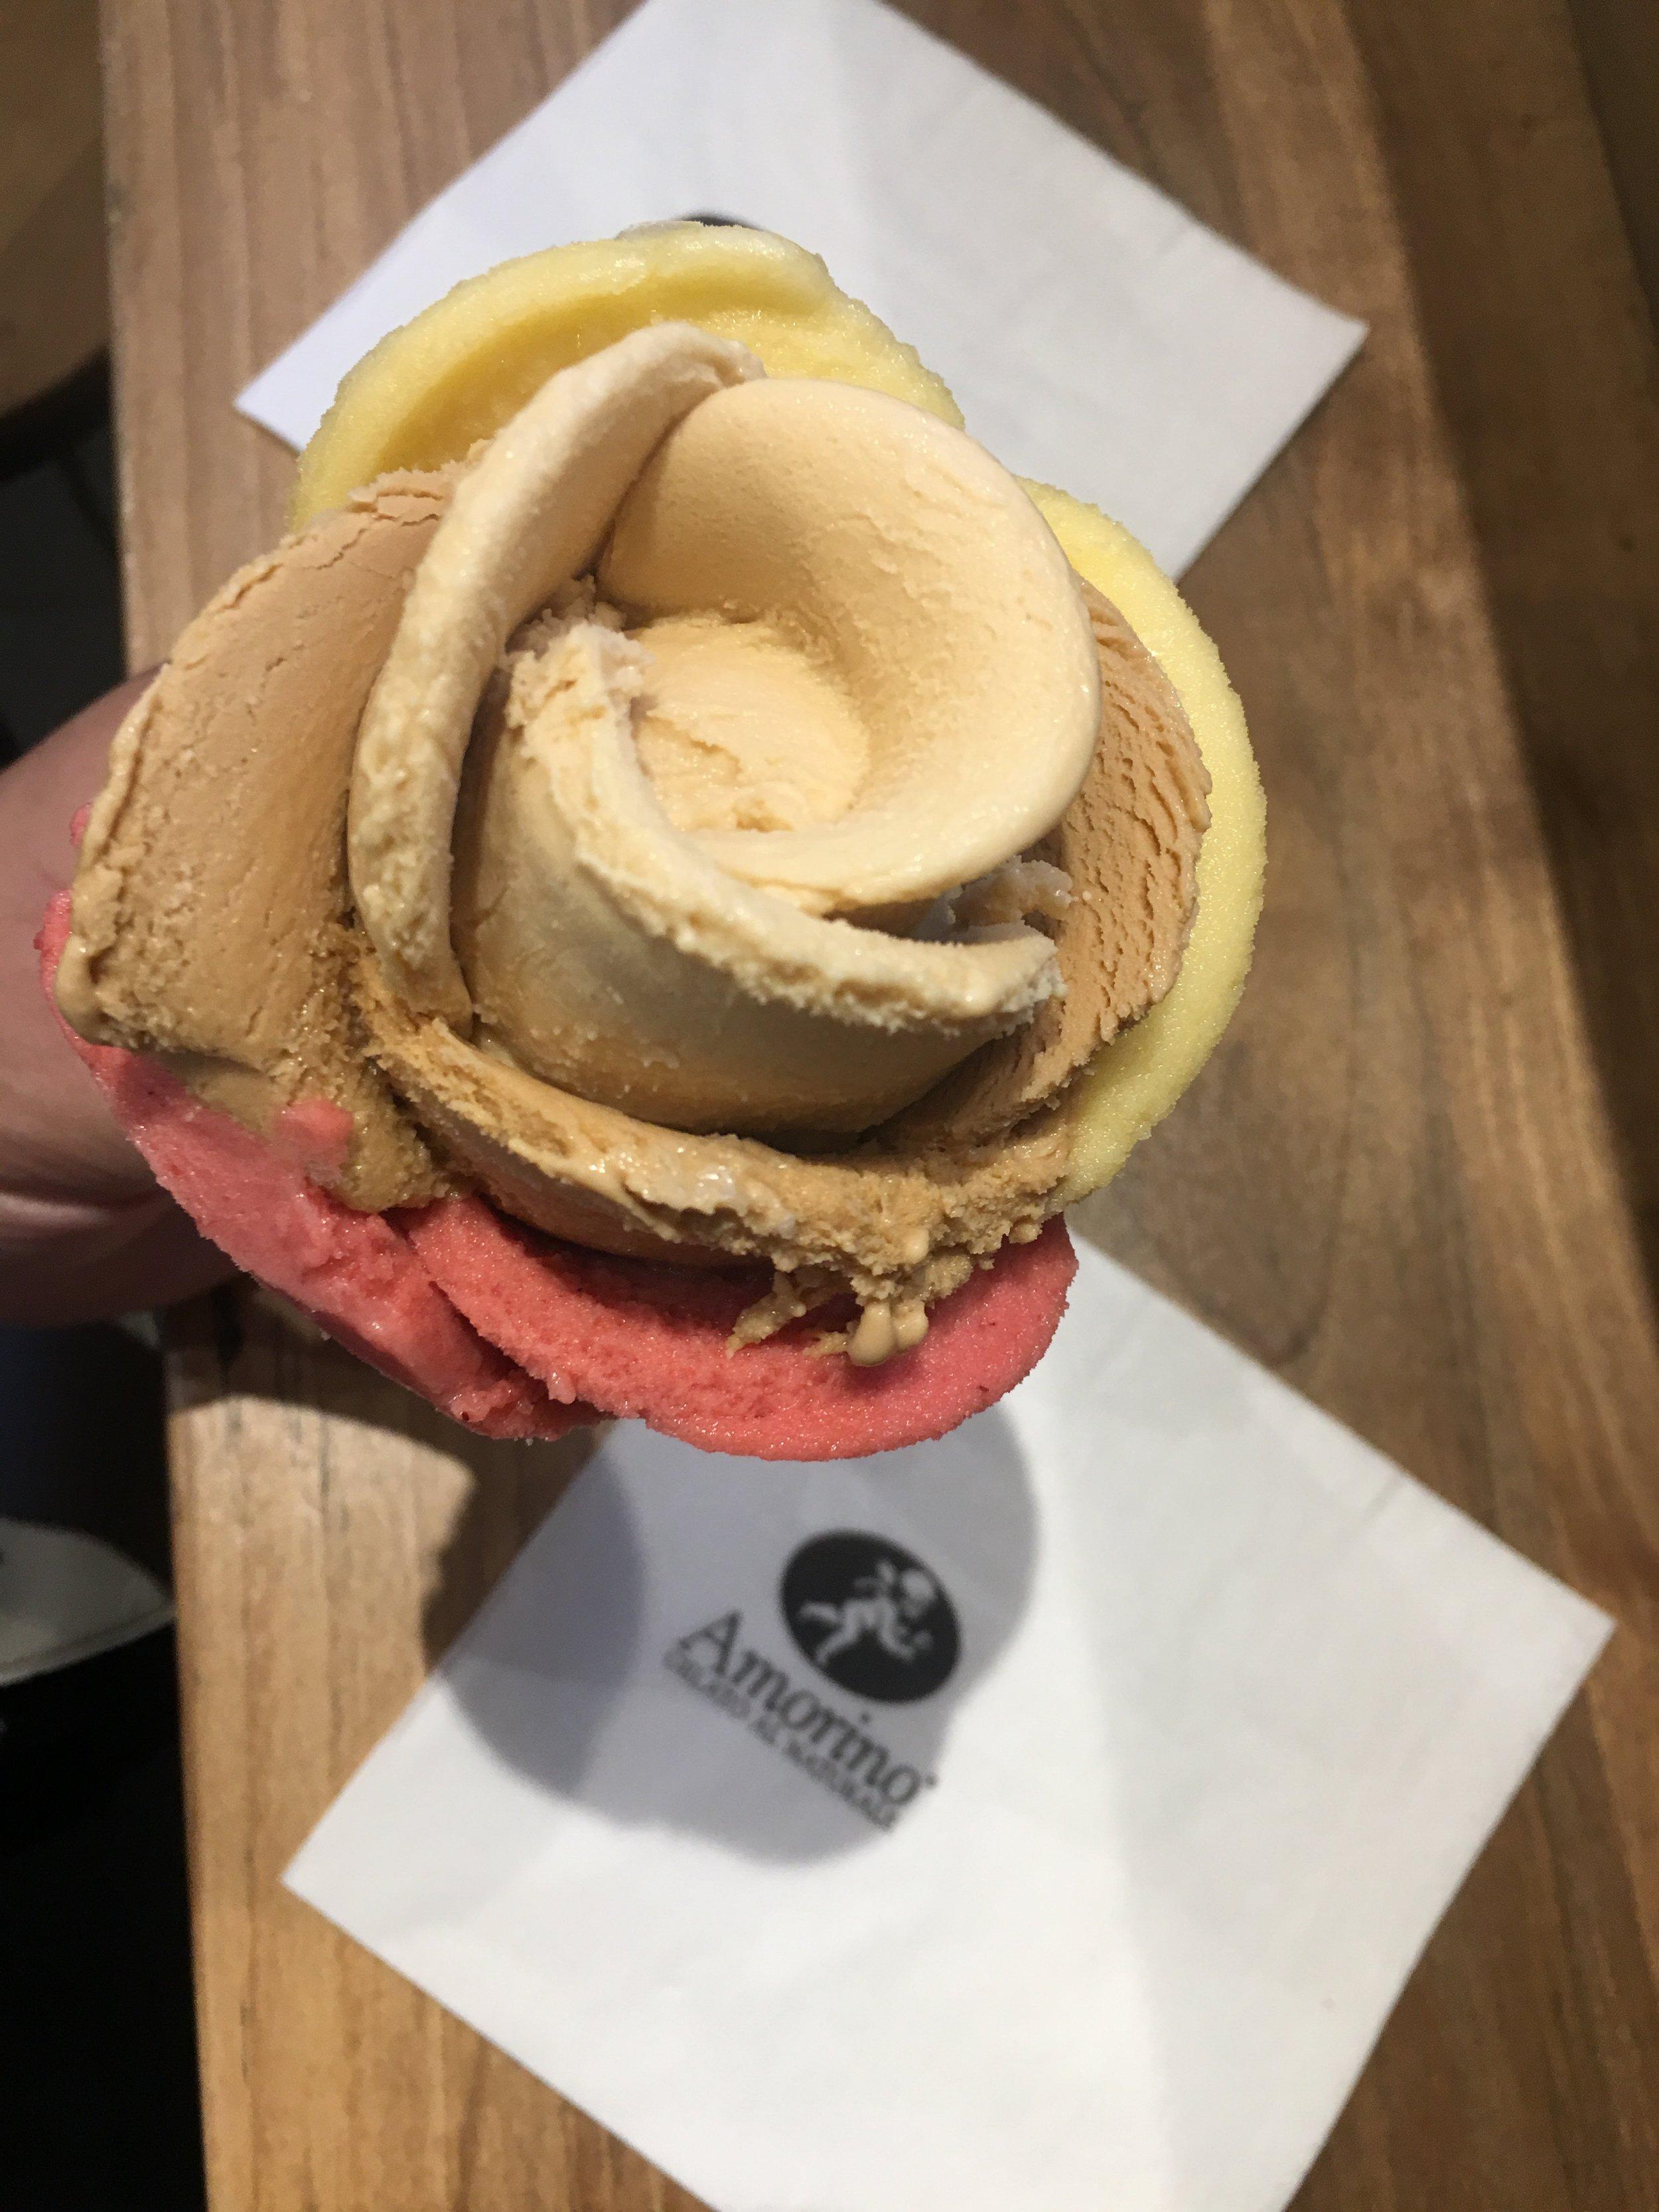 Best ice cream in town - #Amorino